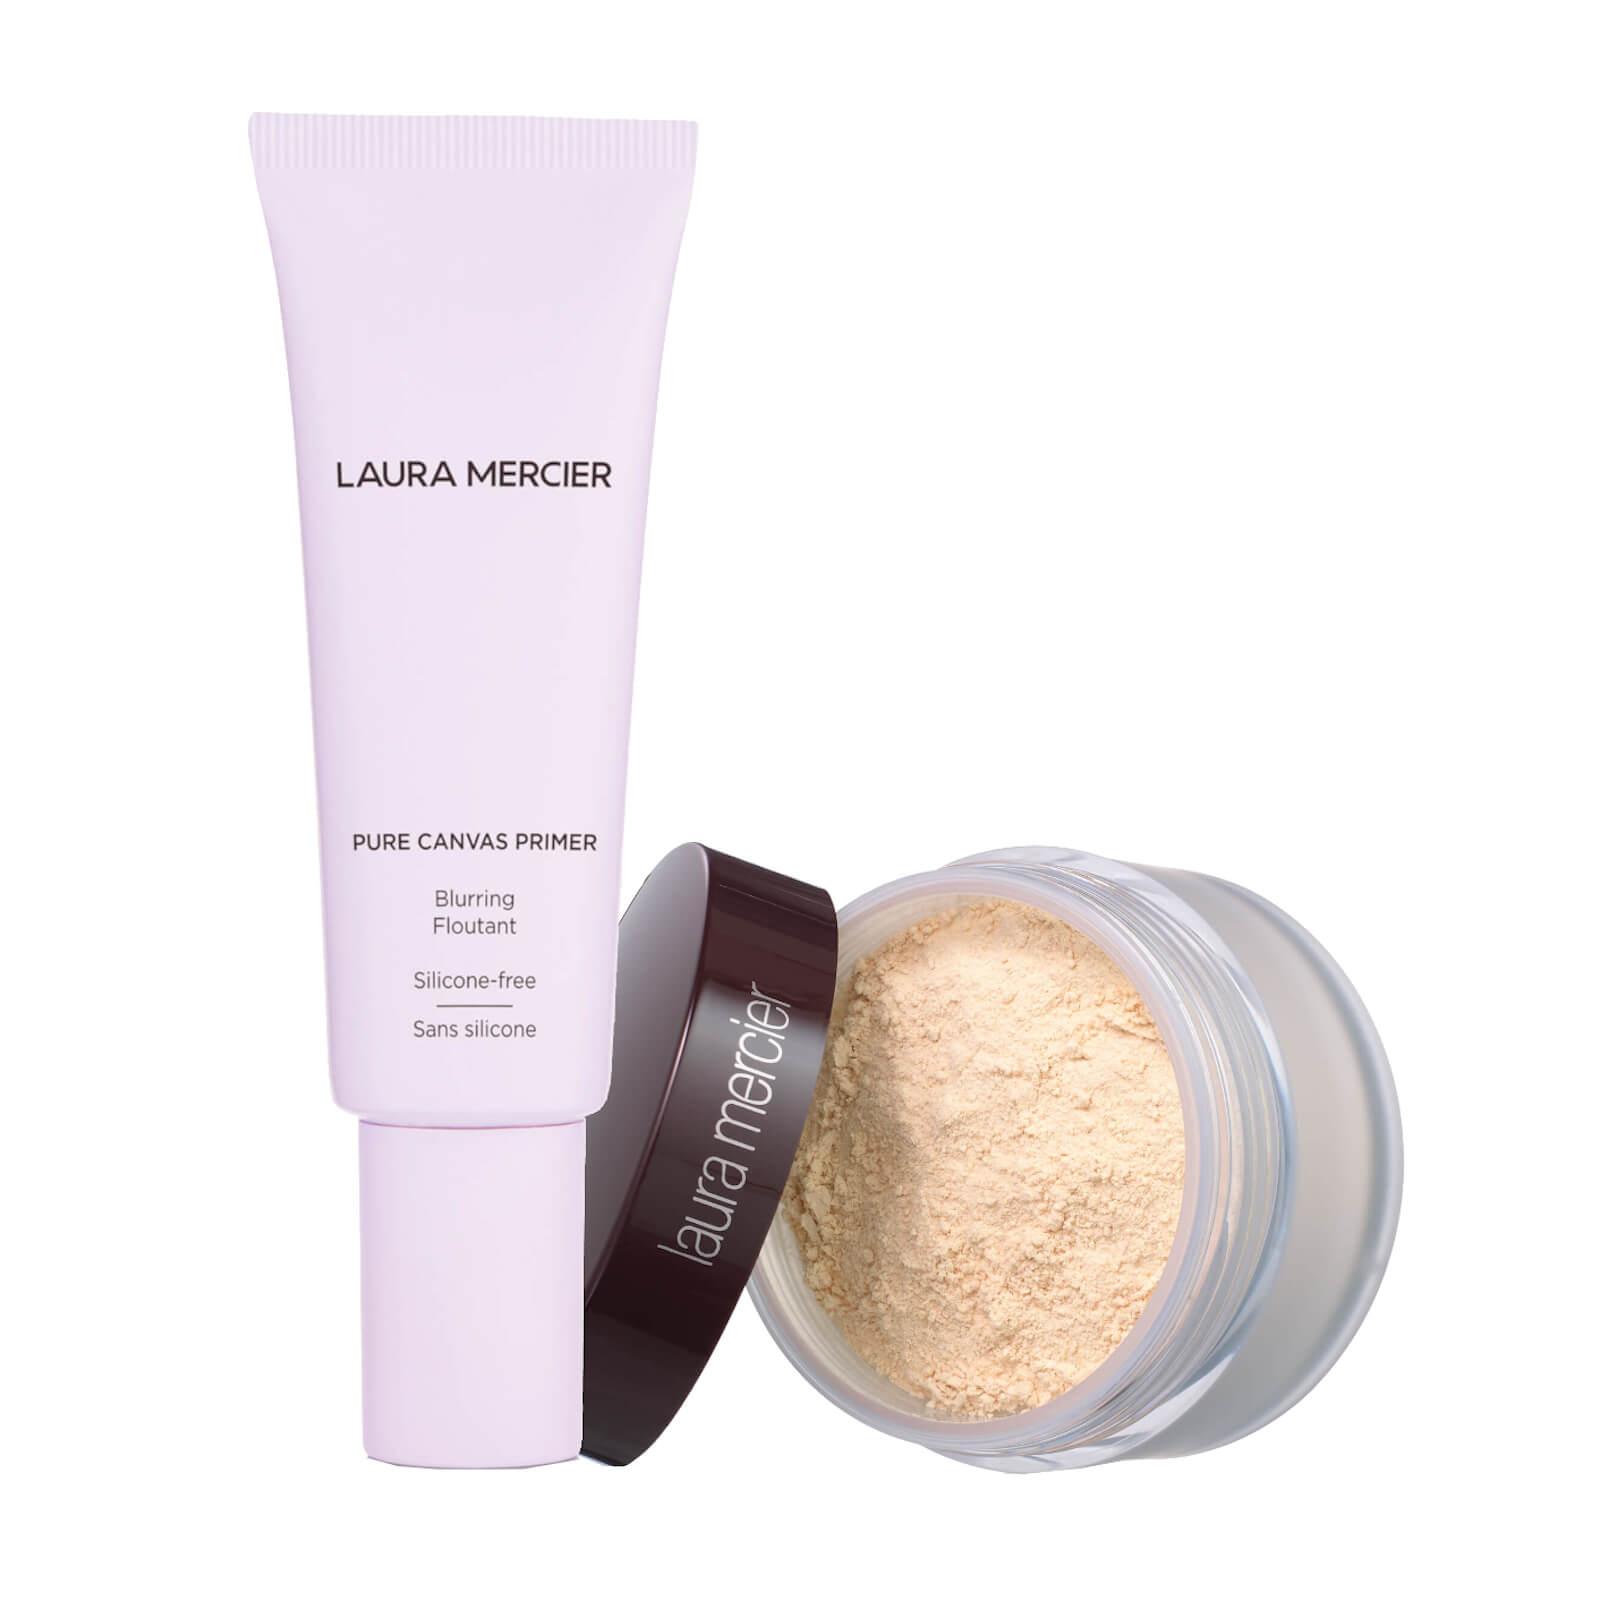 Laura Mercier Pure Canvas Primer- Blurring and Translucent Loose Setting Powder (Various Shades) - Translucent